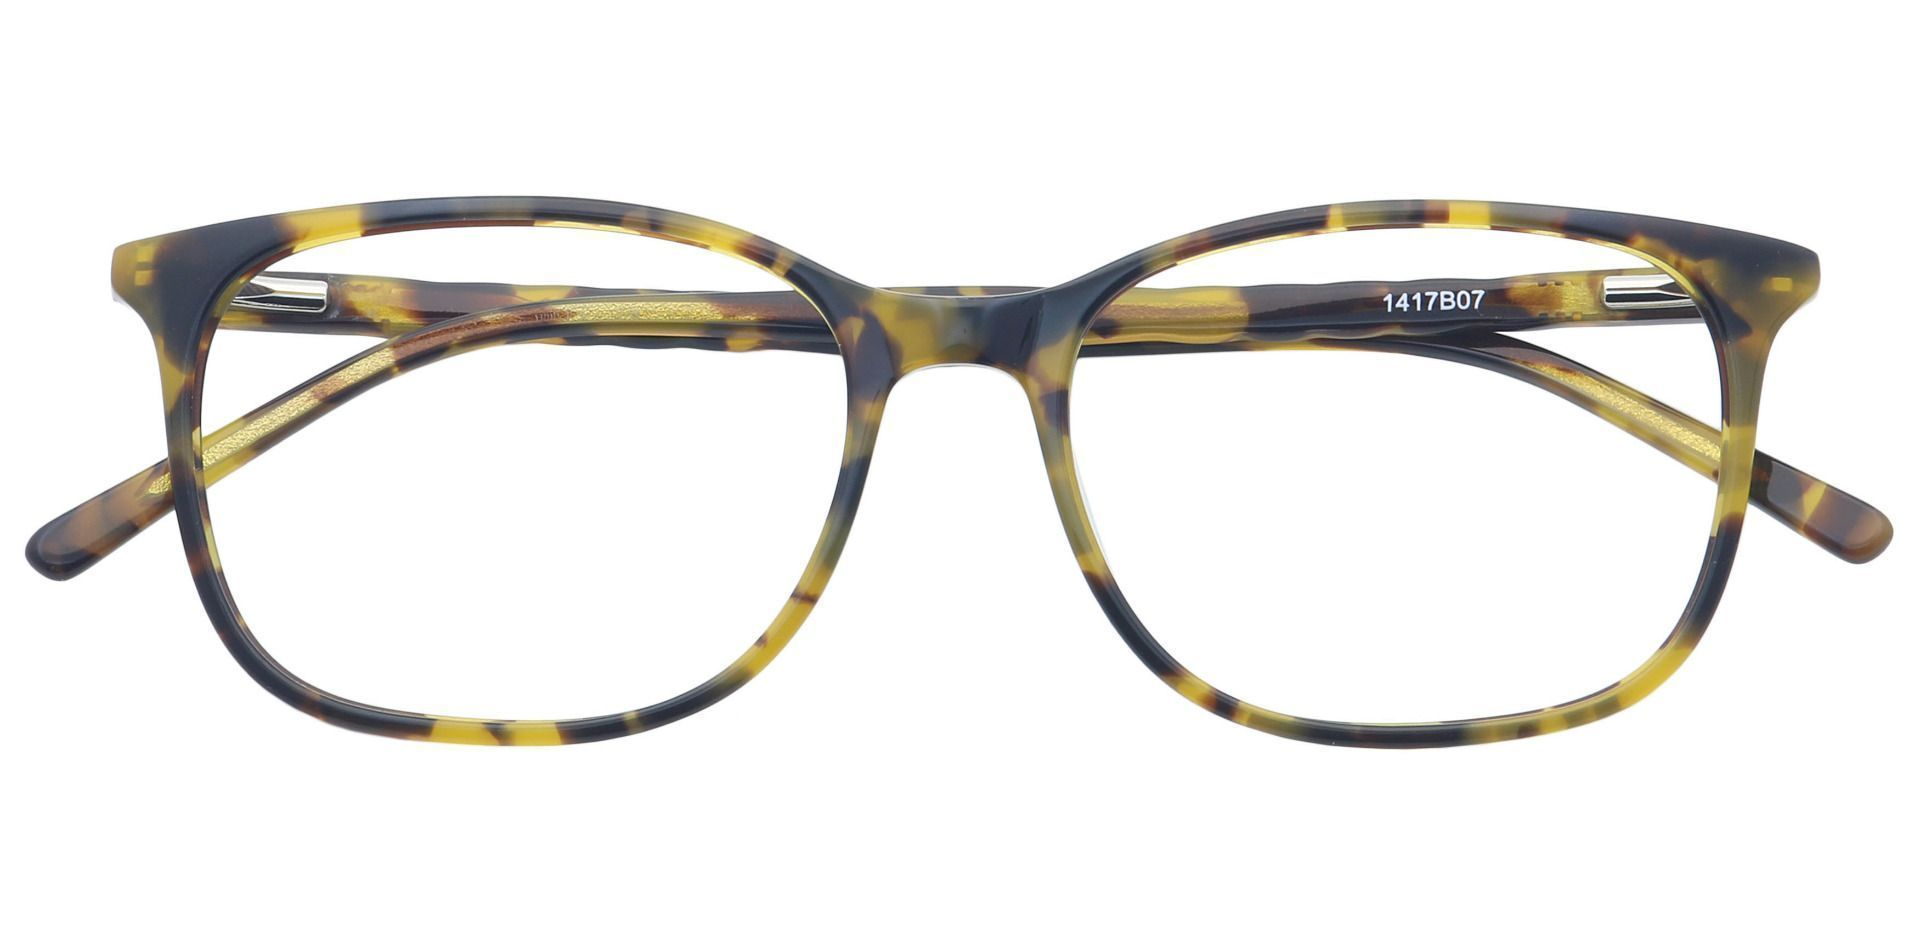 Mason Square Eyeglasses Frame - Brown